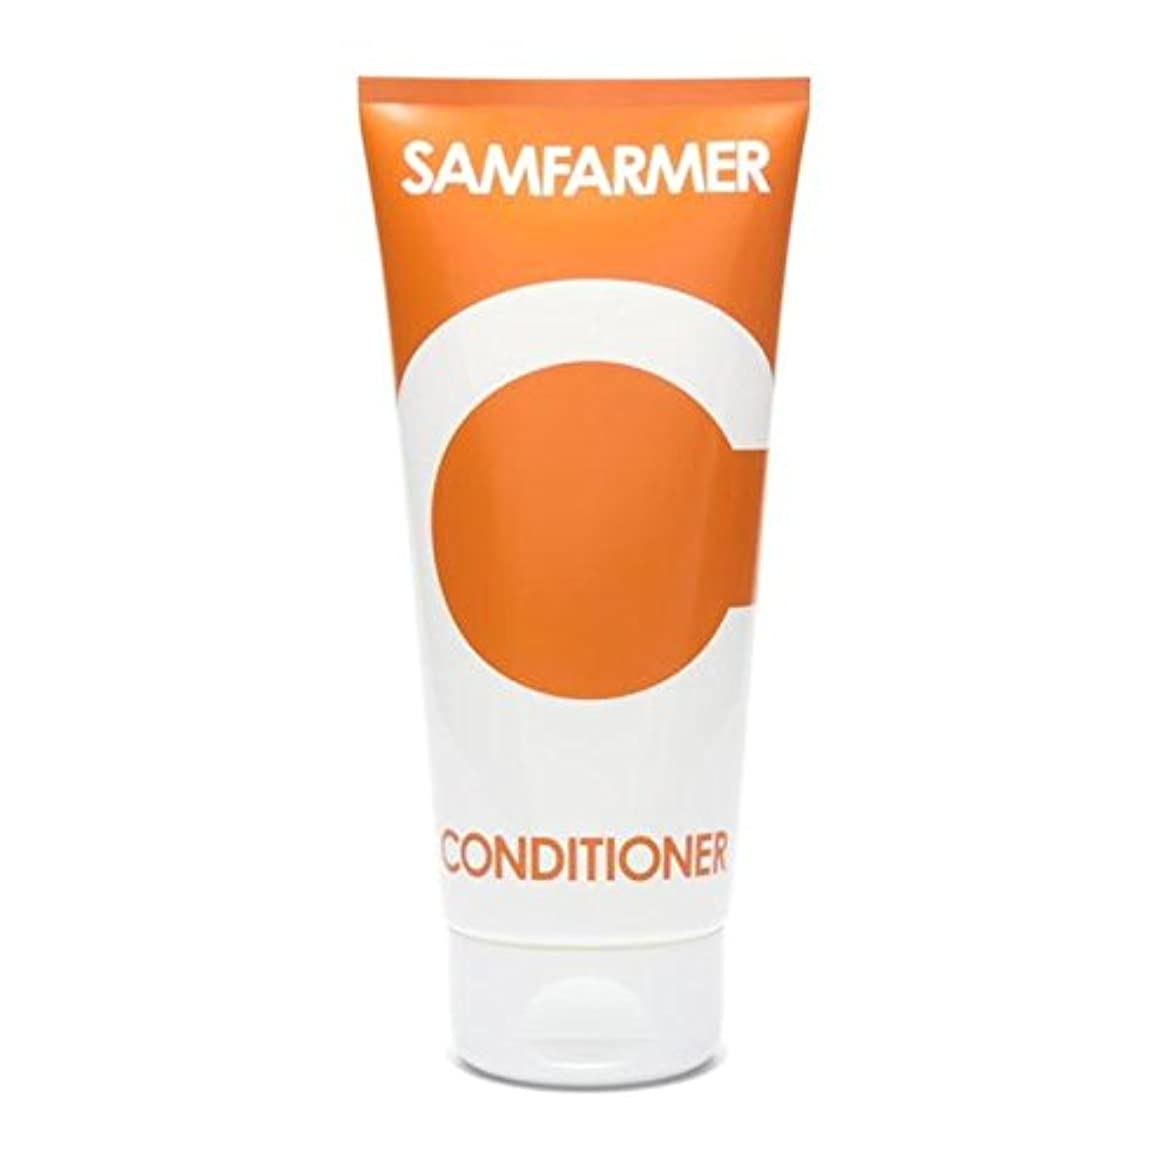 SAMFARMER Unisex Conditioner 200ml (Pack of 6) - ユニセックスコンディショナー200 x6 [並行輸入品]